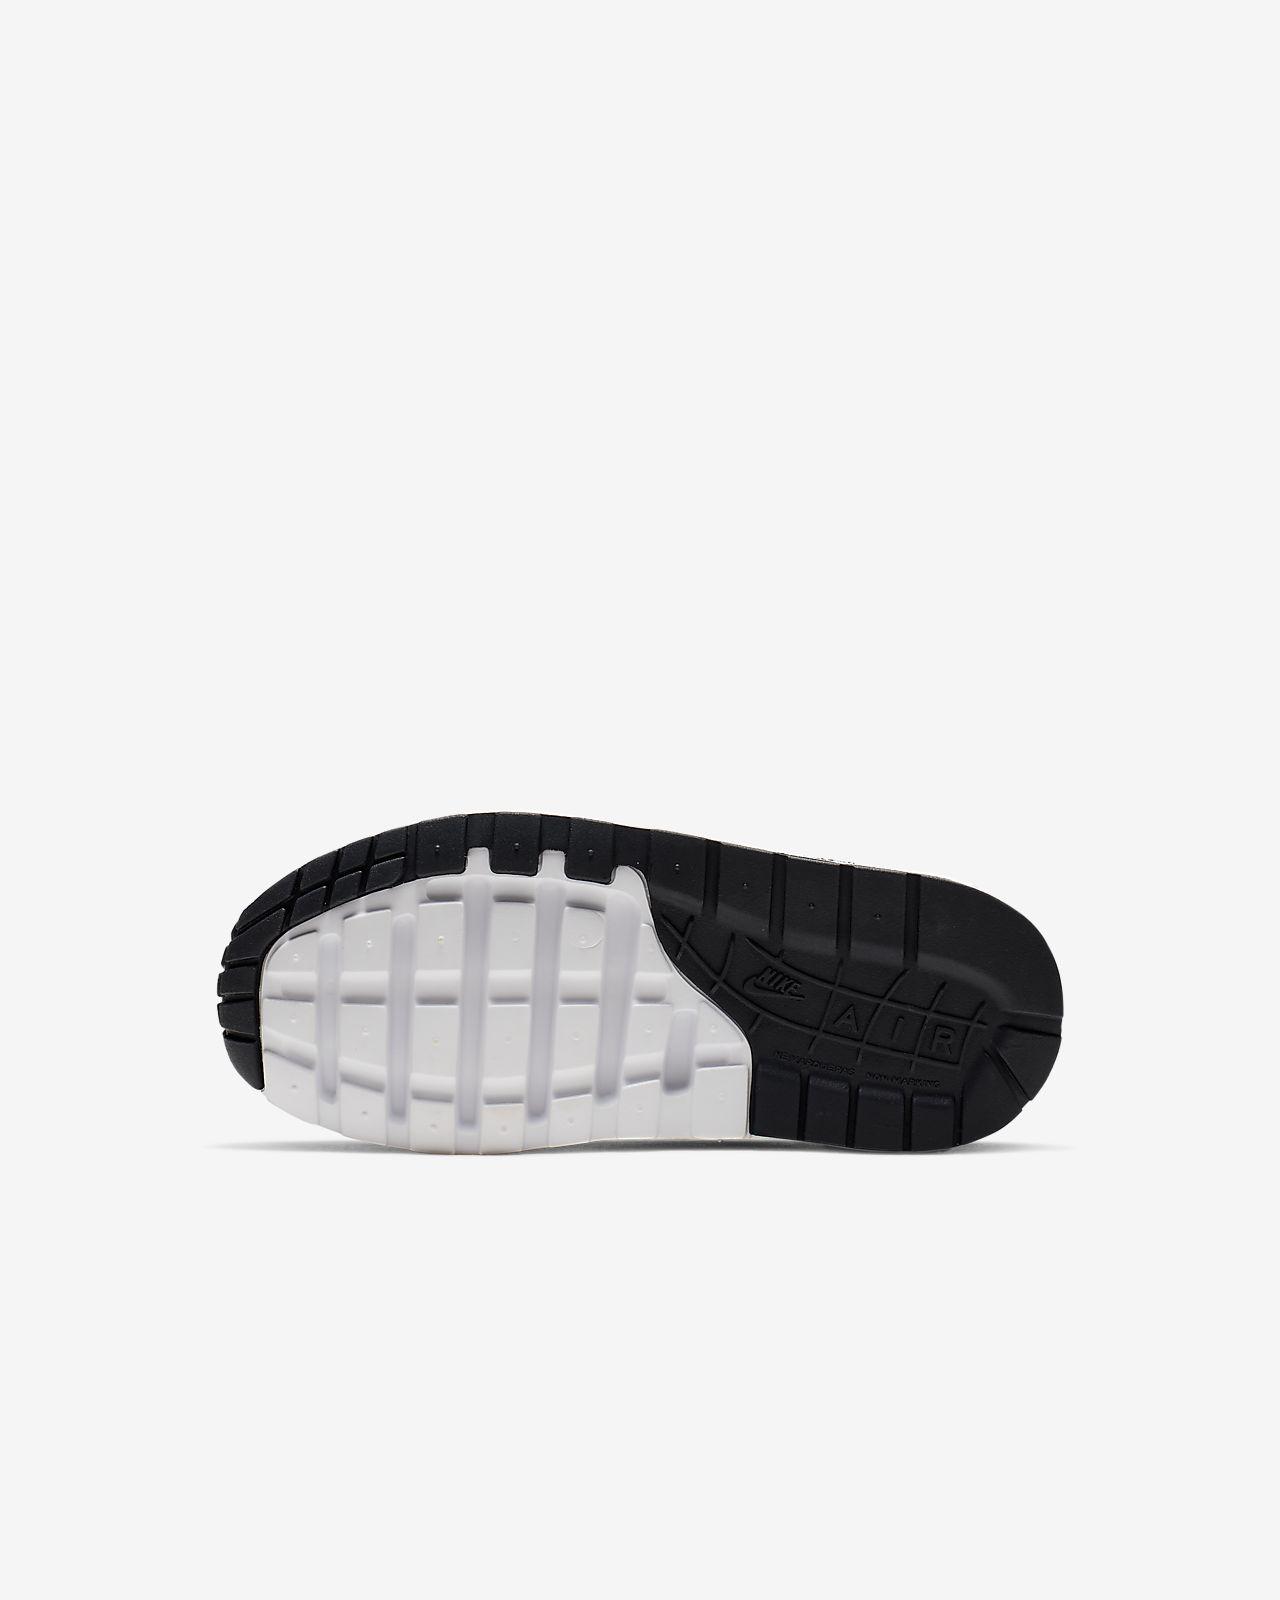 653cd49e0831 Nike Air Max 1 Little Kids  Shoe. Nike.com